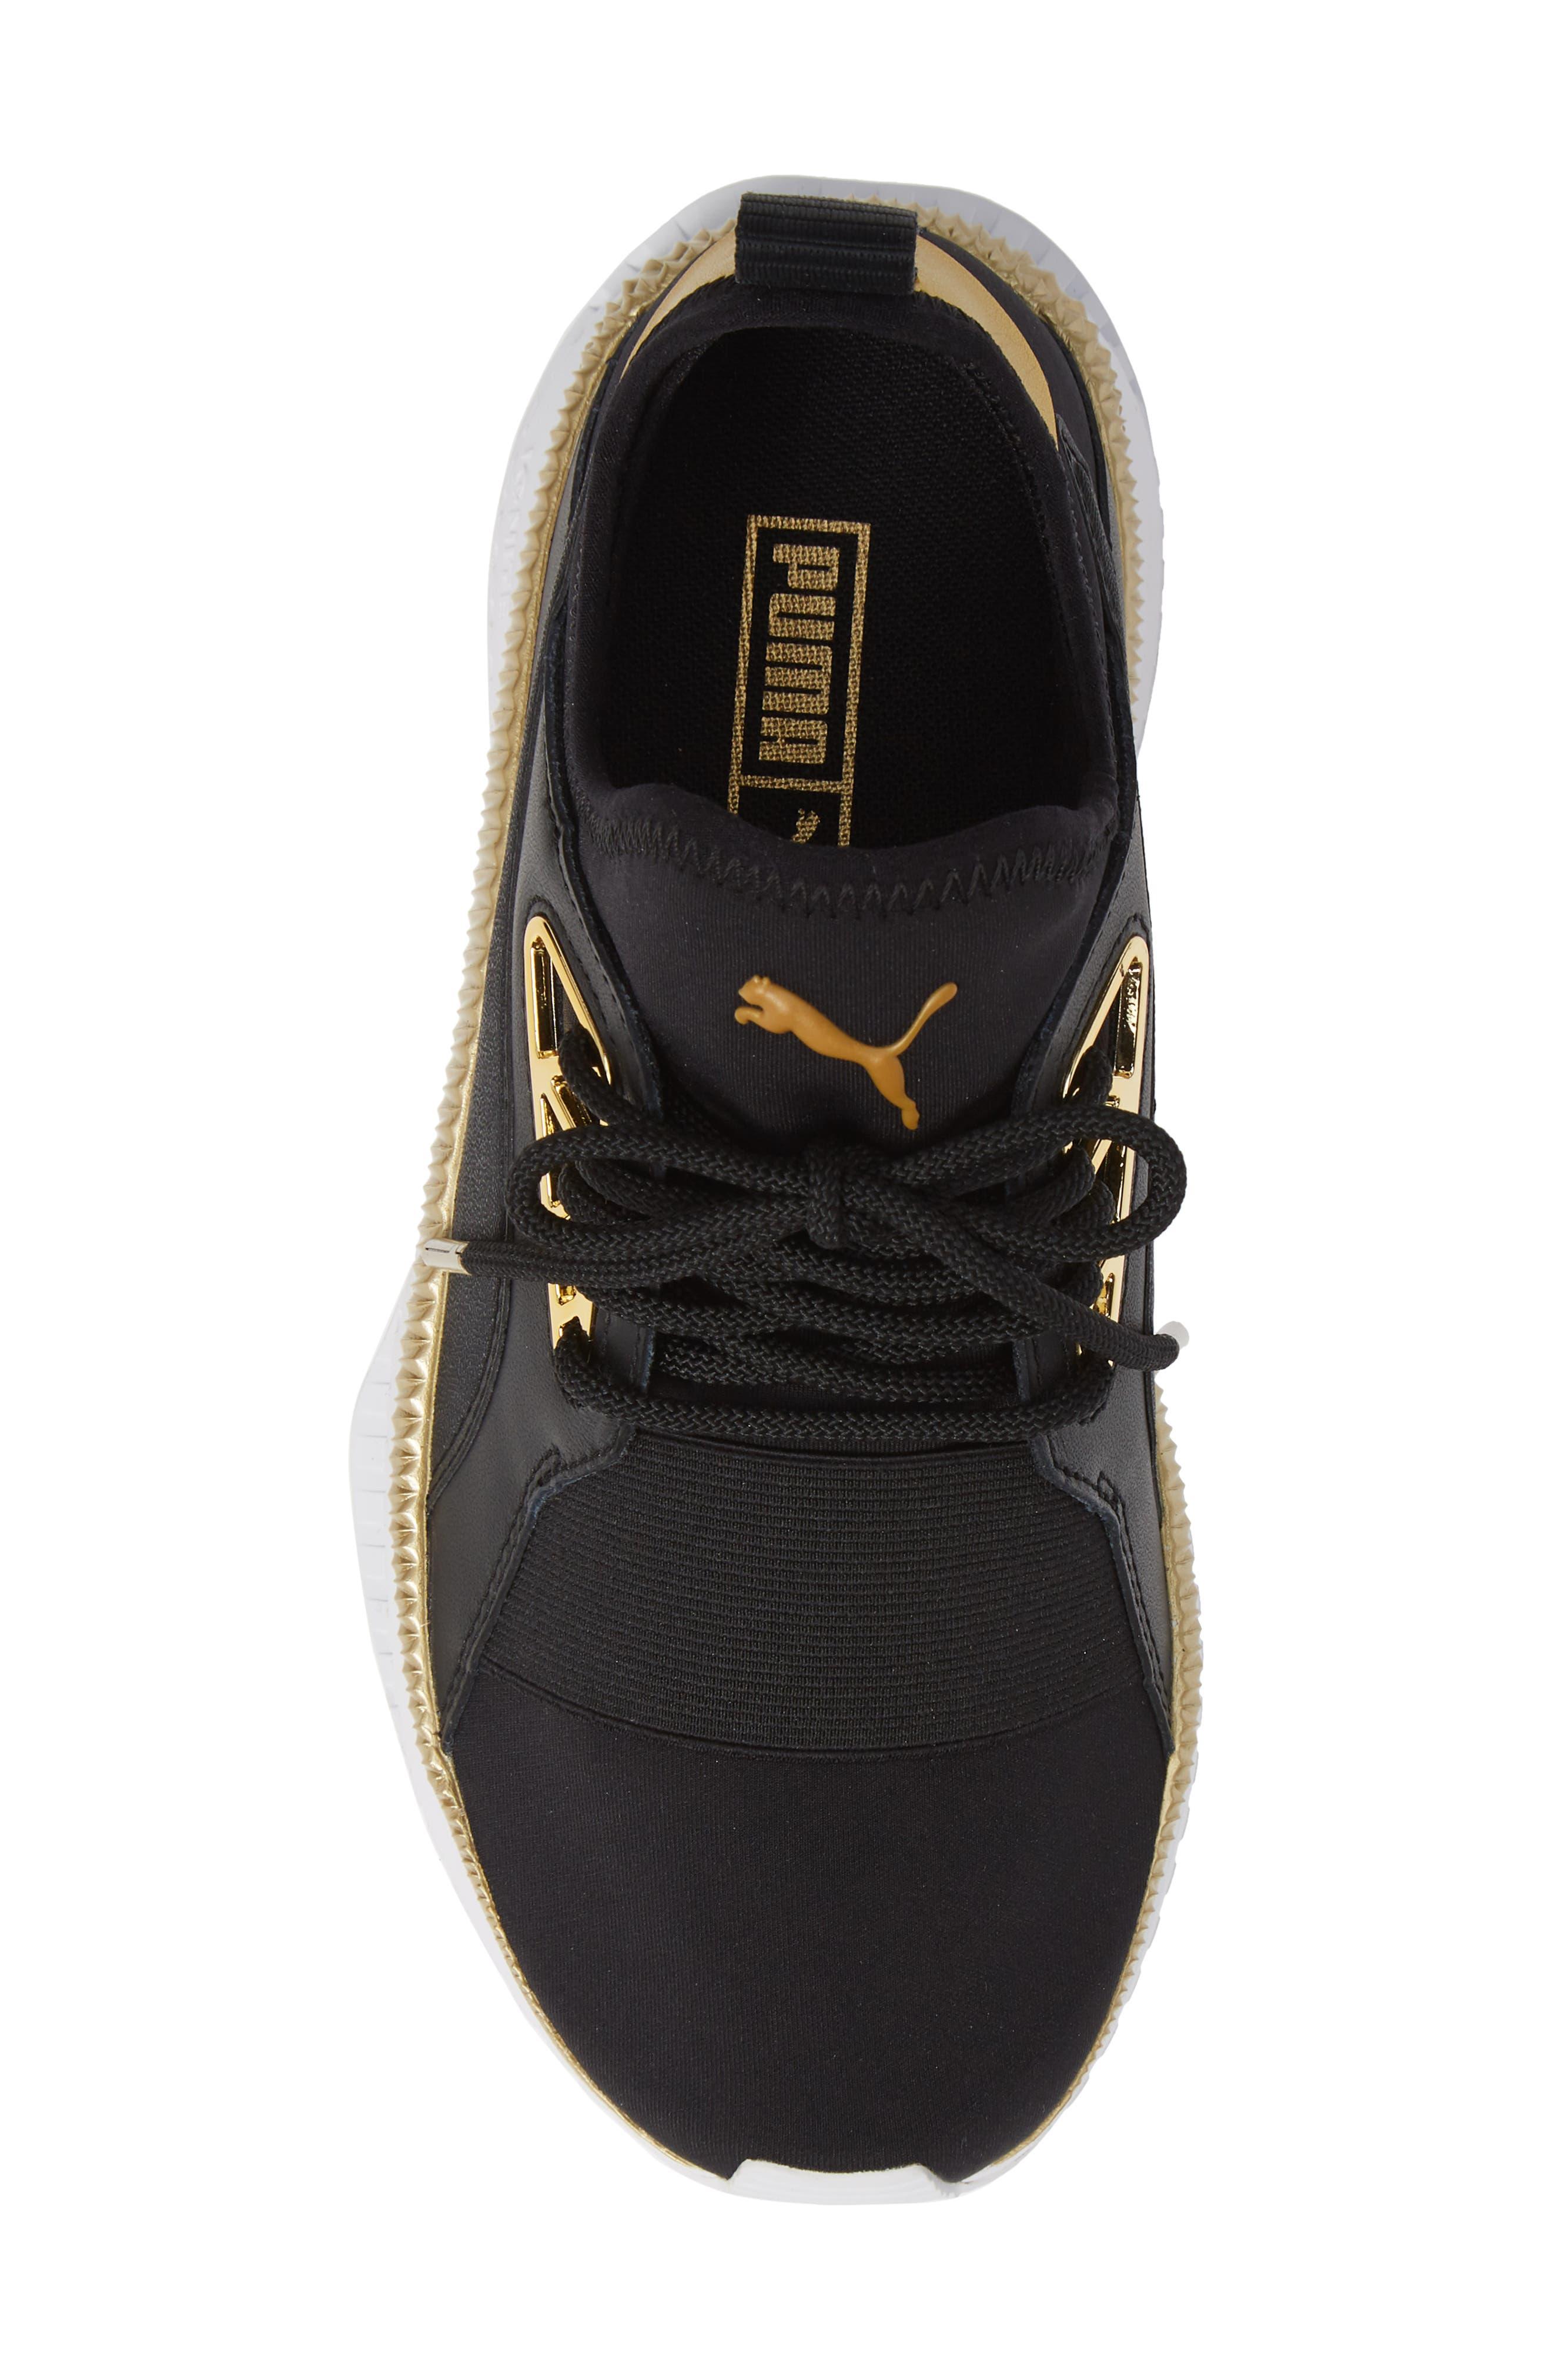 TSUGI Apex Jewel Sneaker,                             Alternate thumbnail 5, color,                             PUMA BLACK/ PUMA BLACK